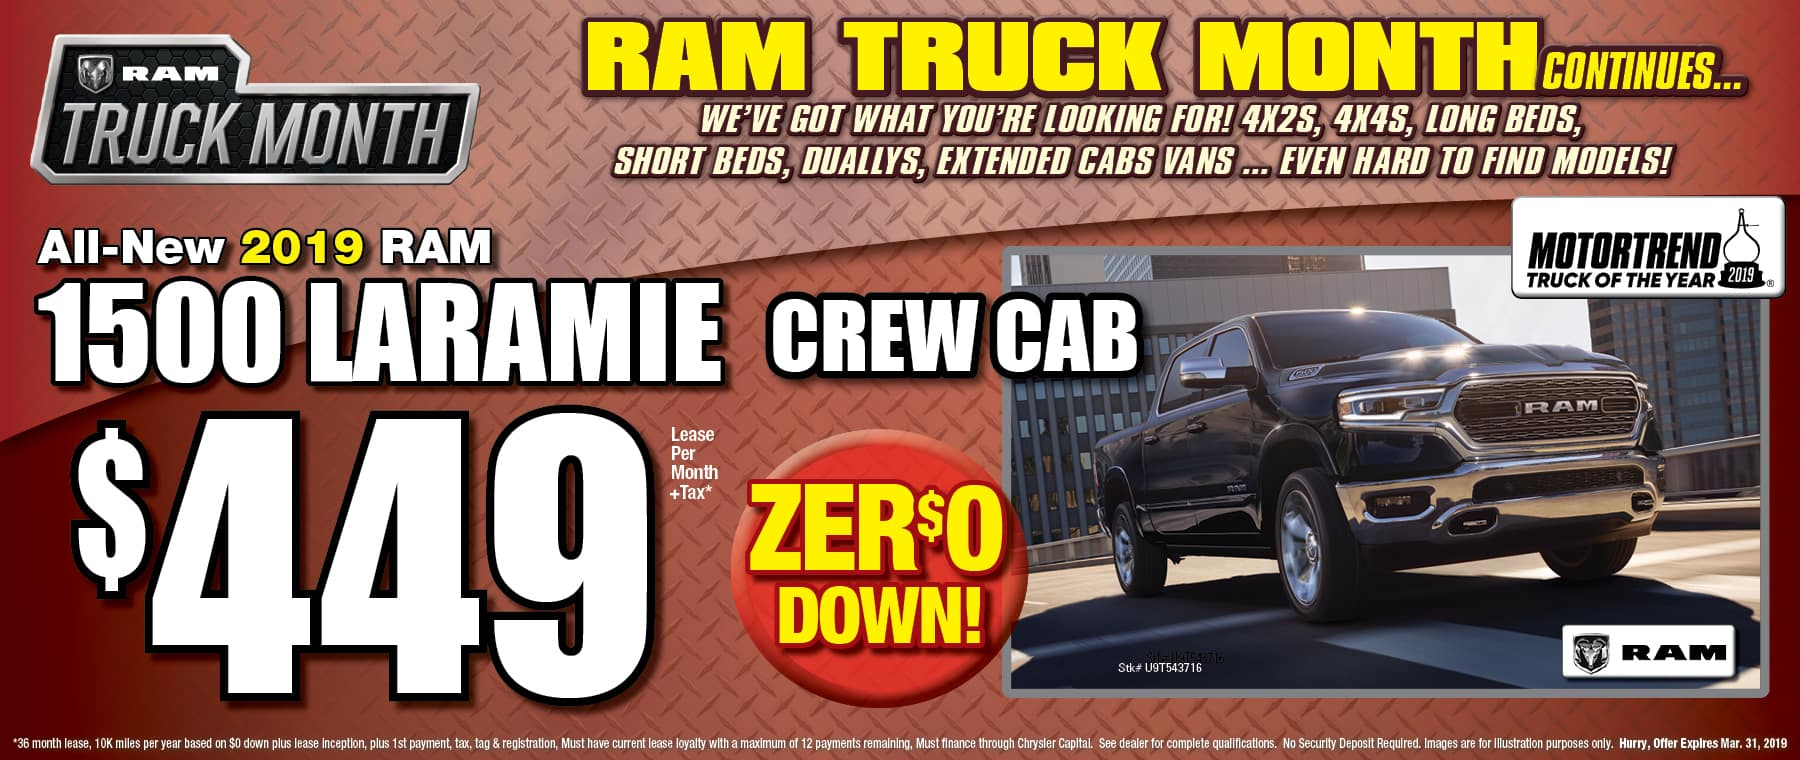 All New 2019 Ram Laramie